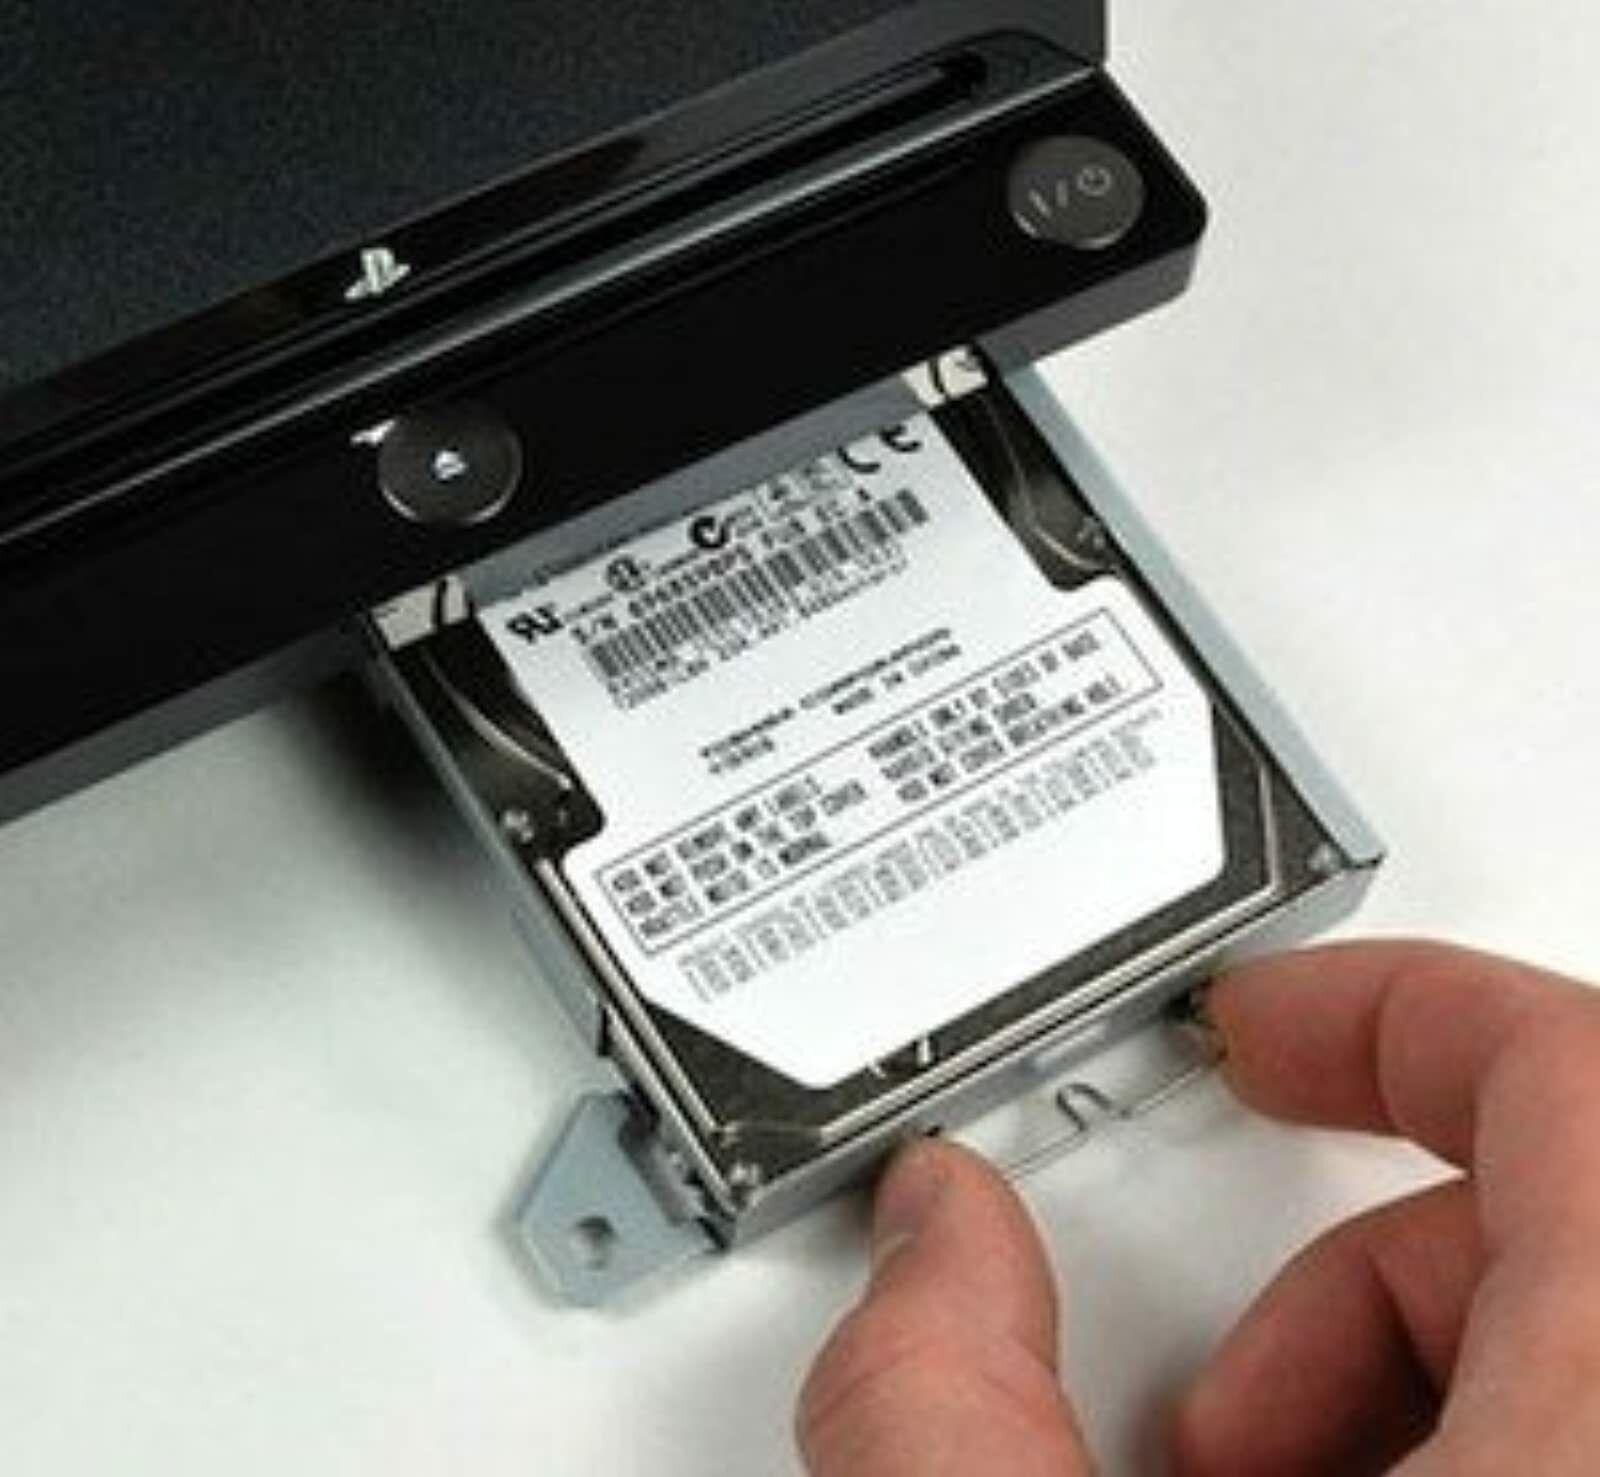 Generic 2.5 SATA Internal Hard Drive 120 GB For PlayStation 3 PS3 Very Good